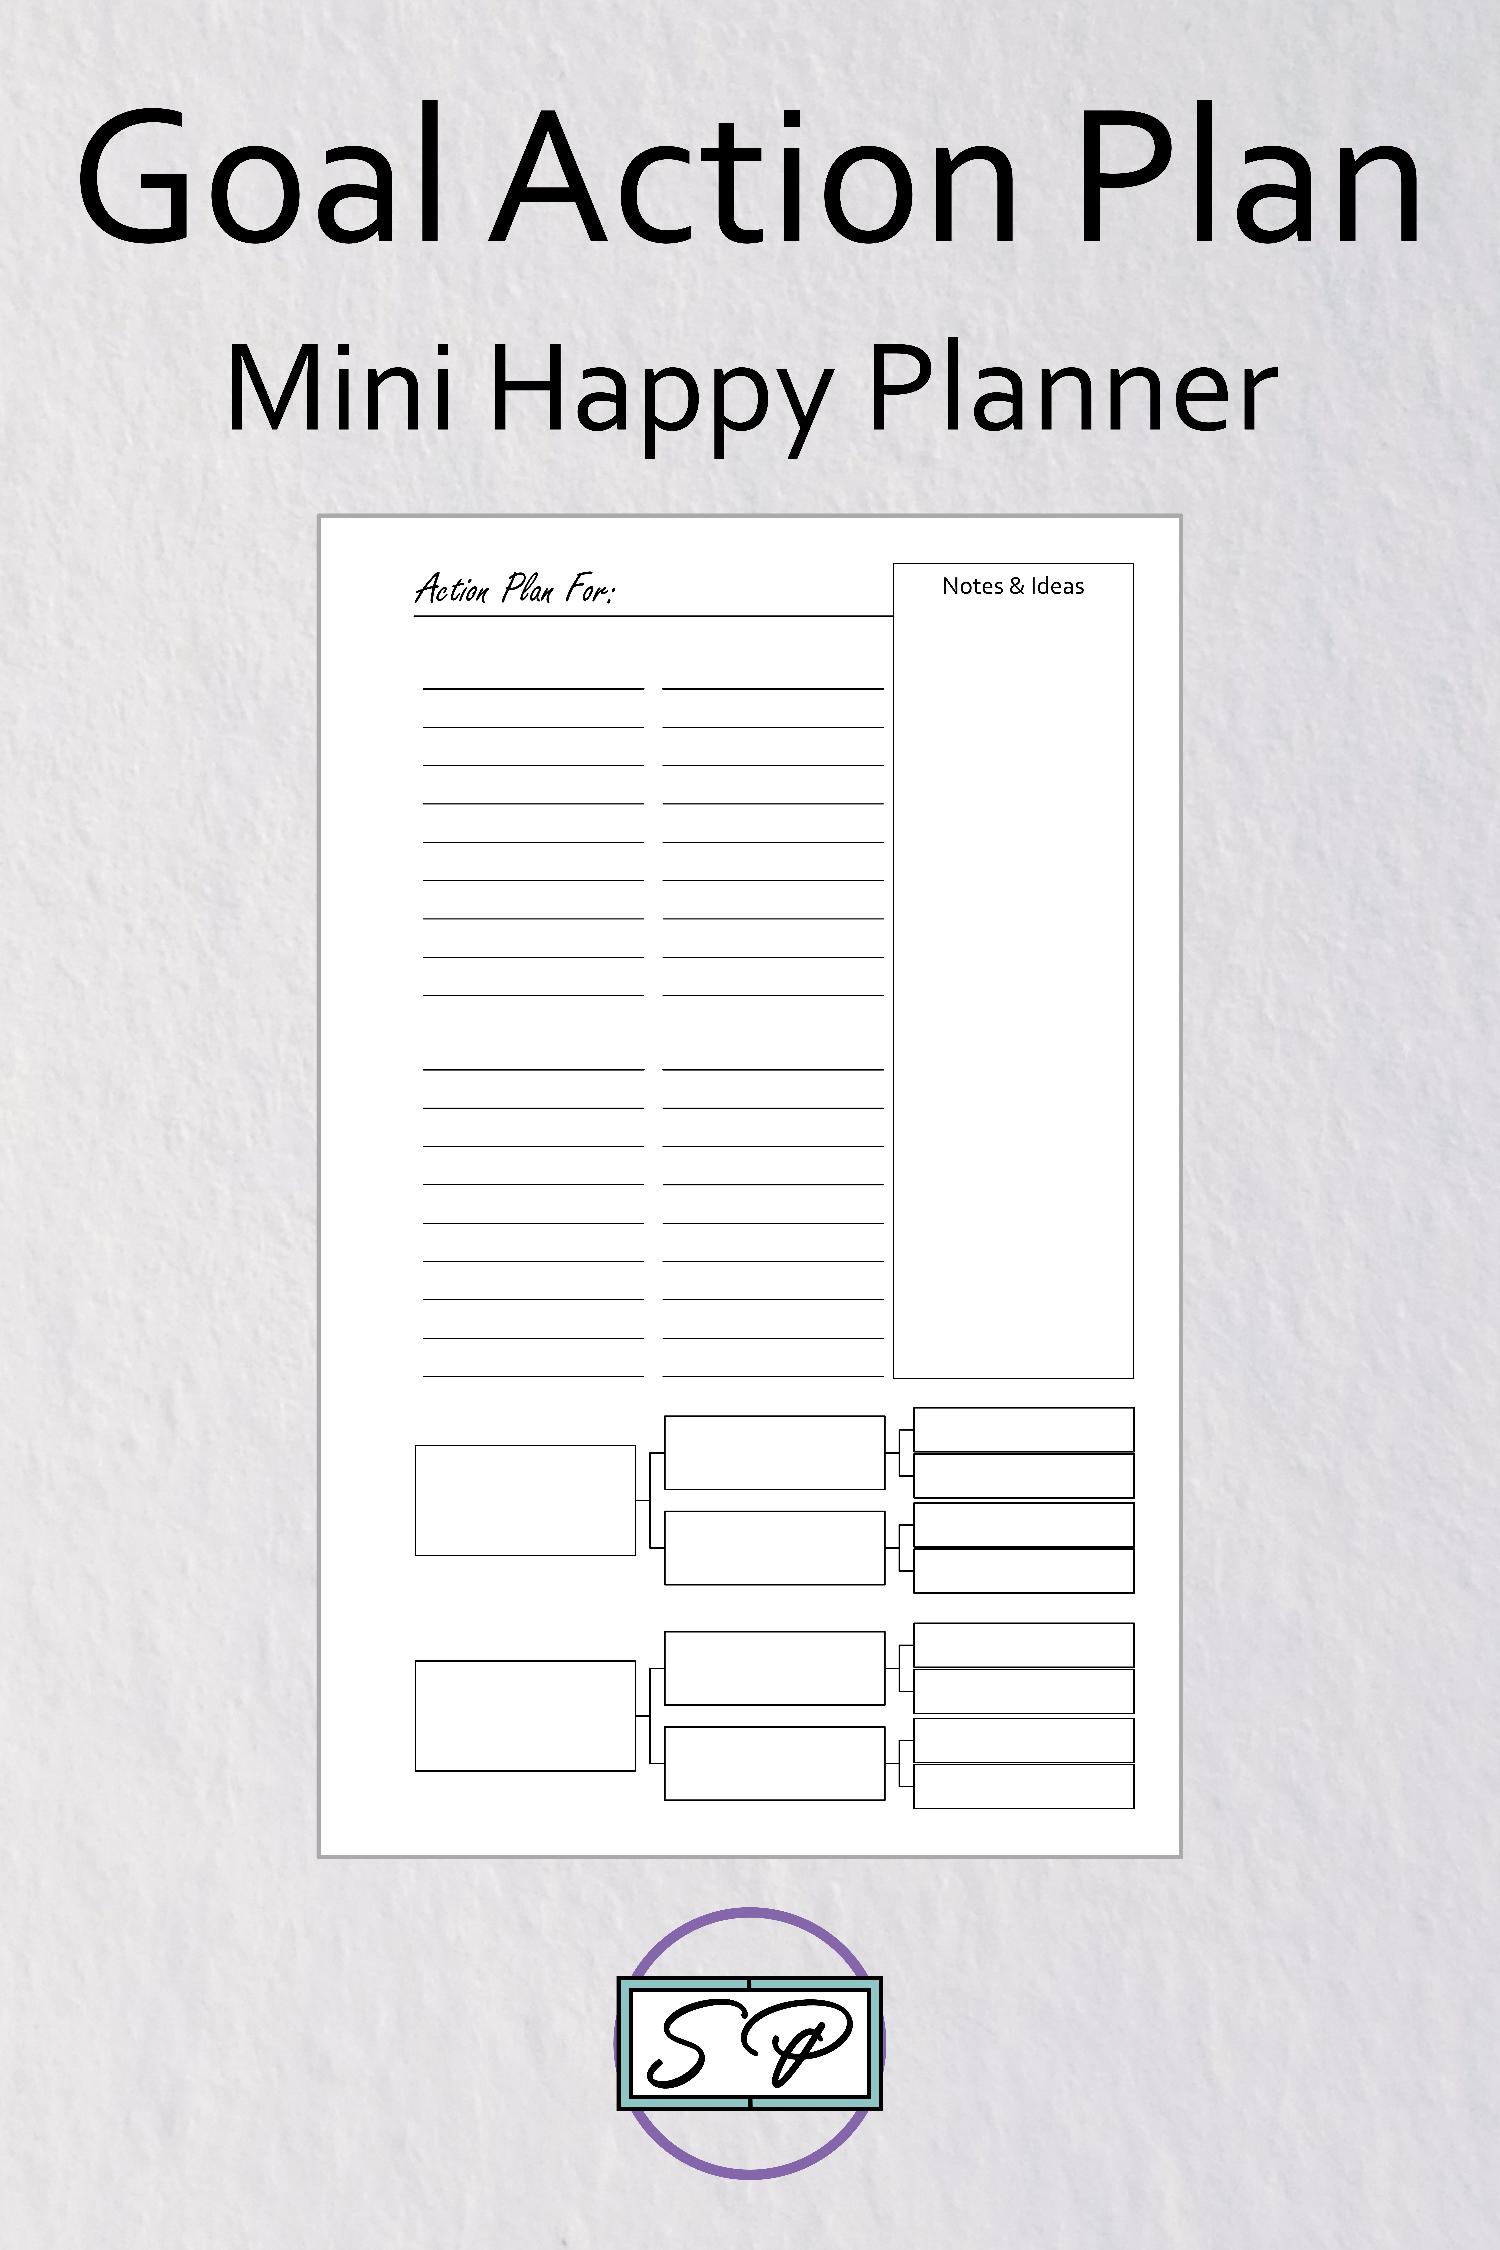 Goal Setting Action Plan Insert Mini Happy Planner Size